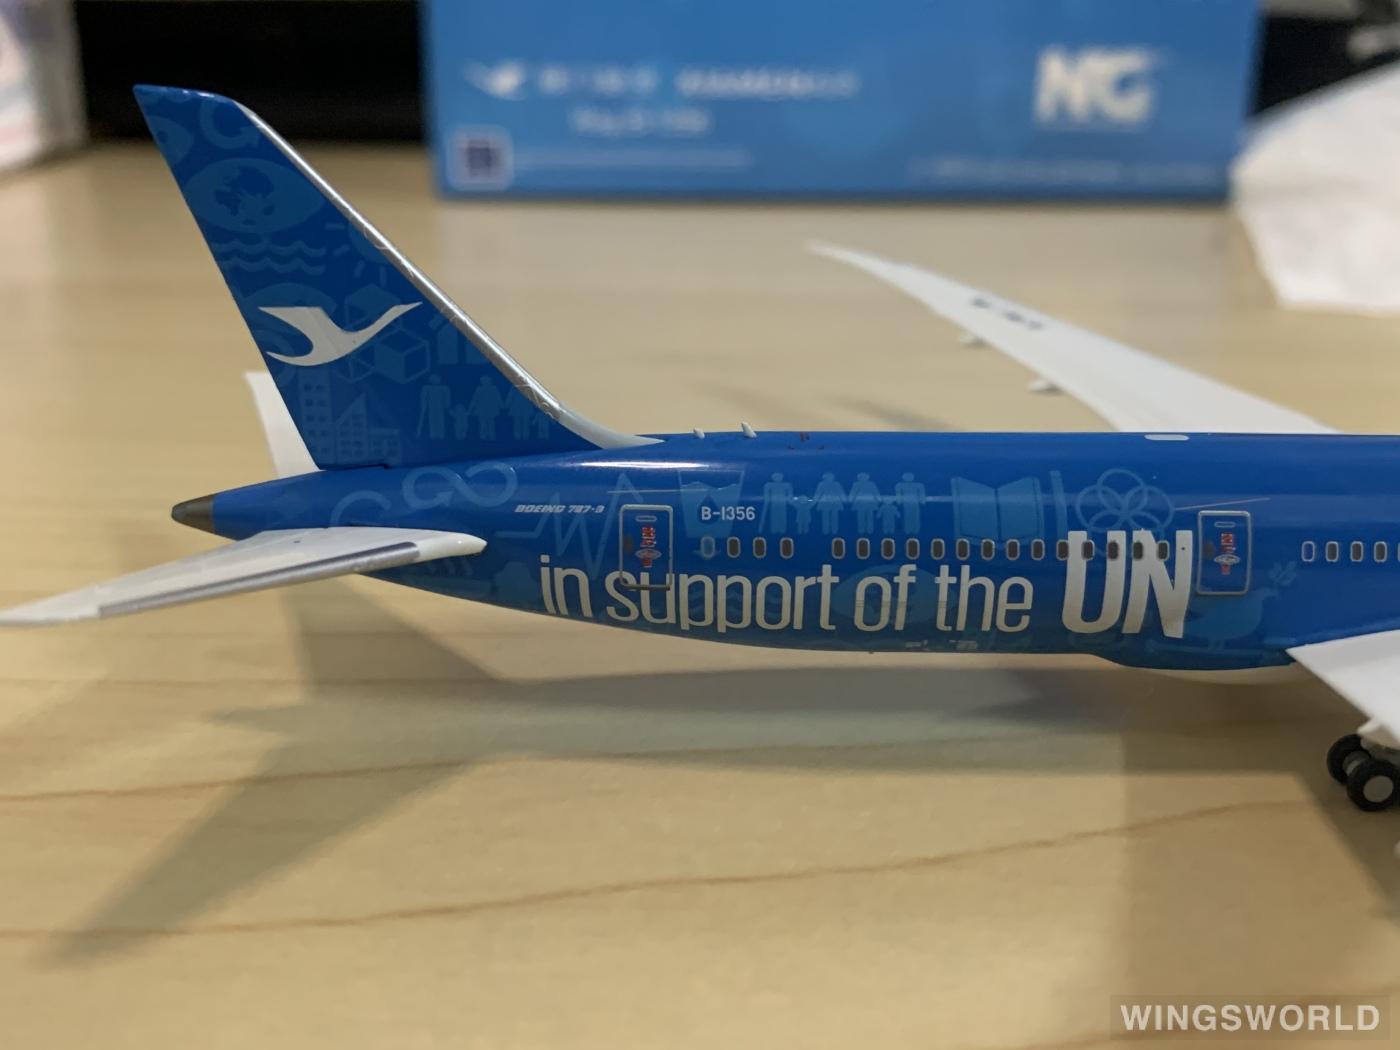 Ngmodel 1:400 NG55052 XiamenAir 厦门航空 Boeing 787-9 B-1356